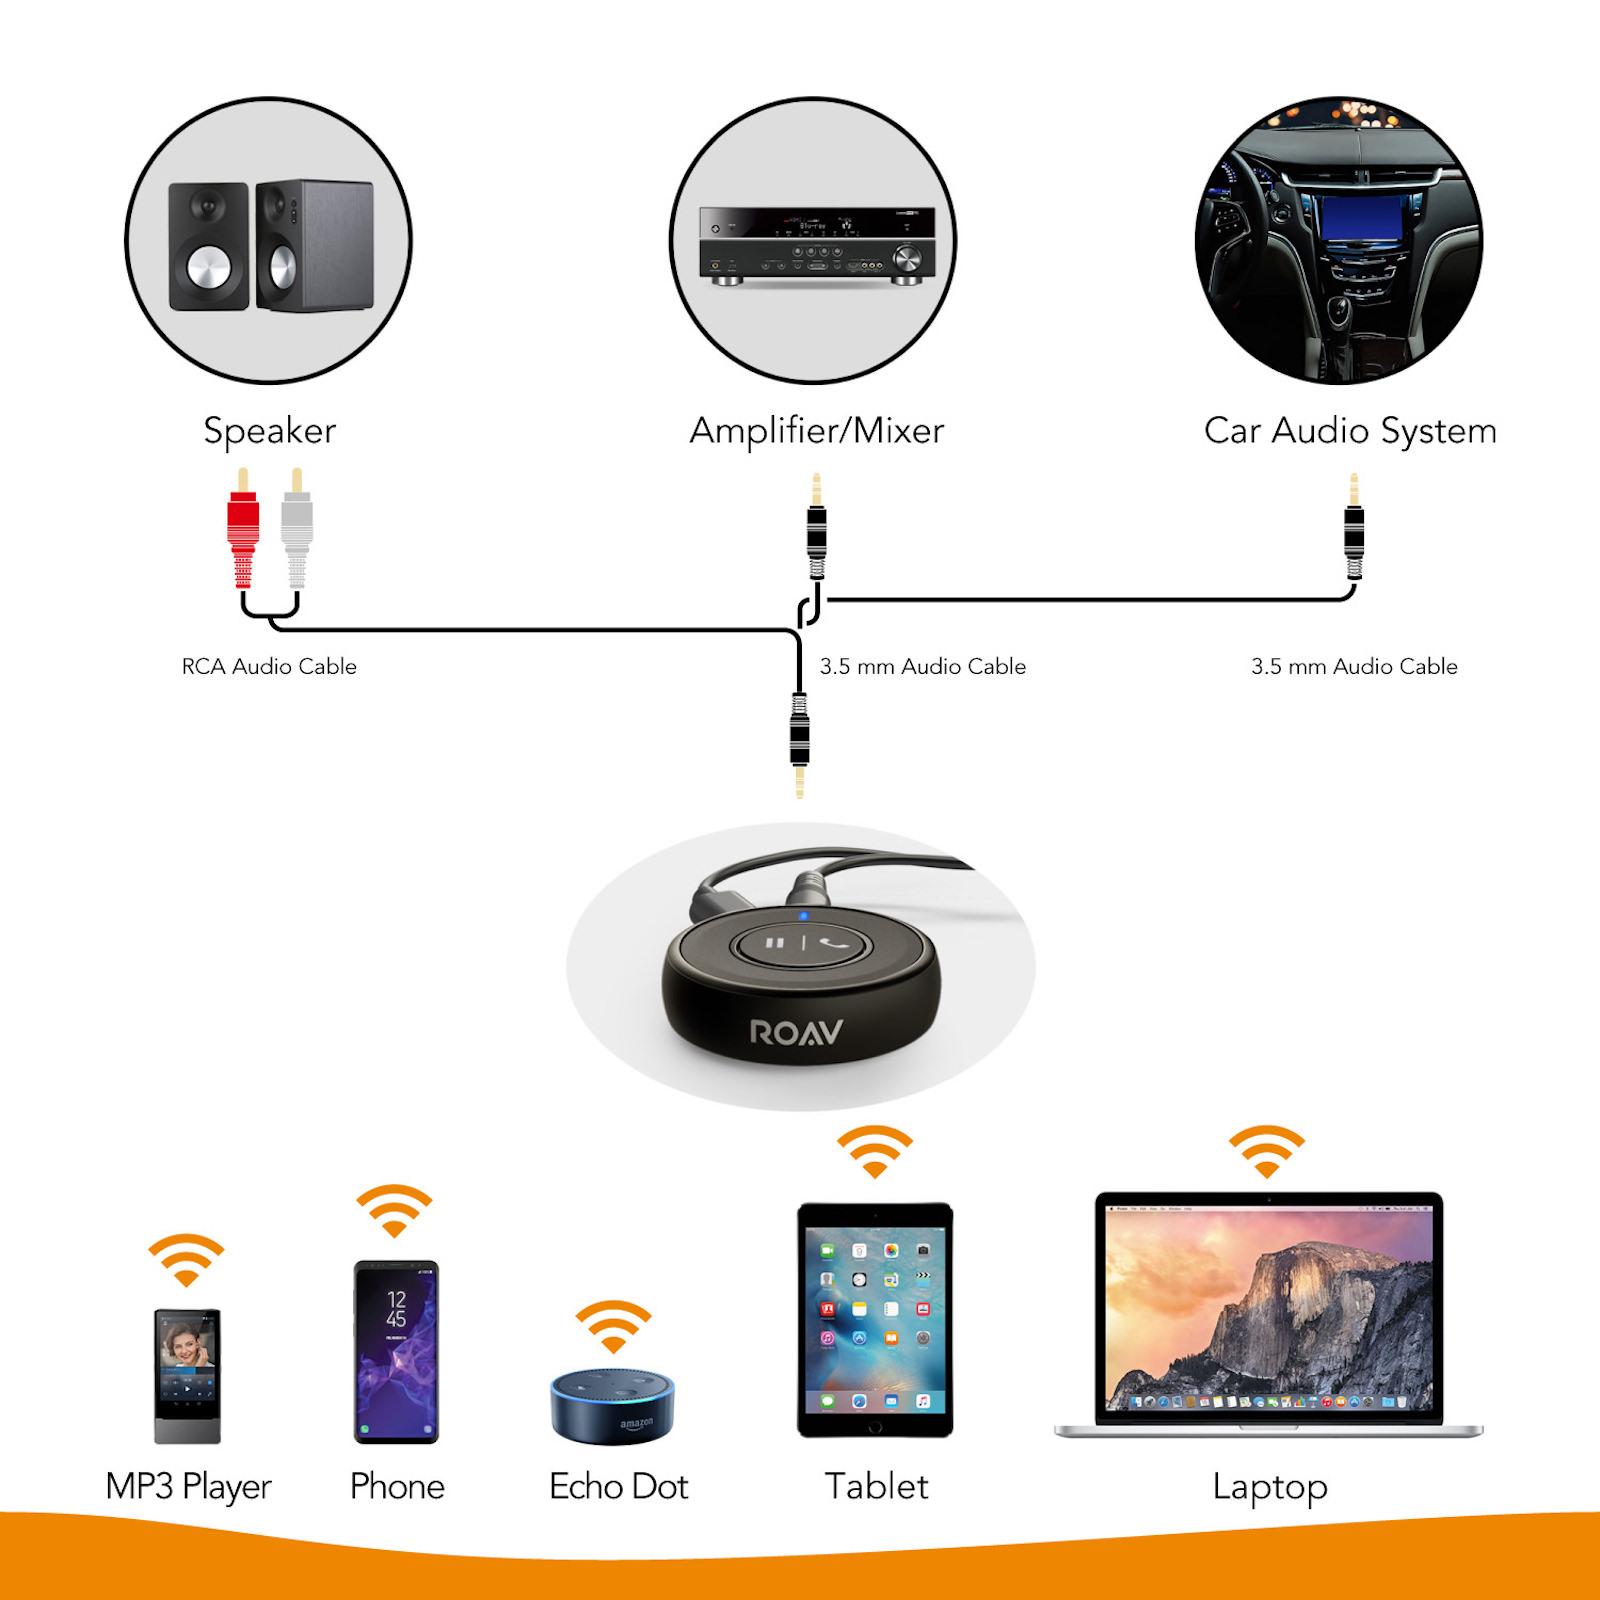 Anker-Roav-Bluetooth-Receiver-B2-2.jpg